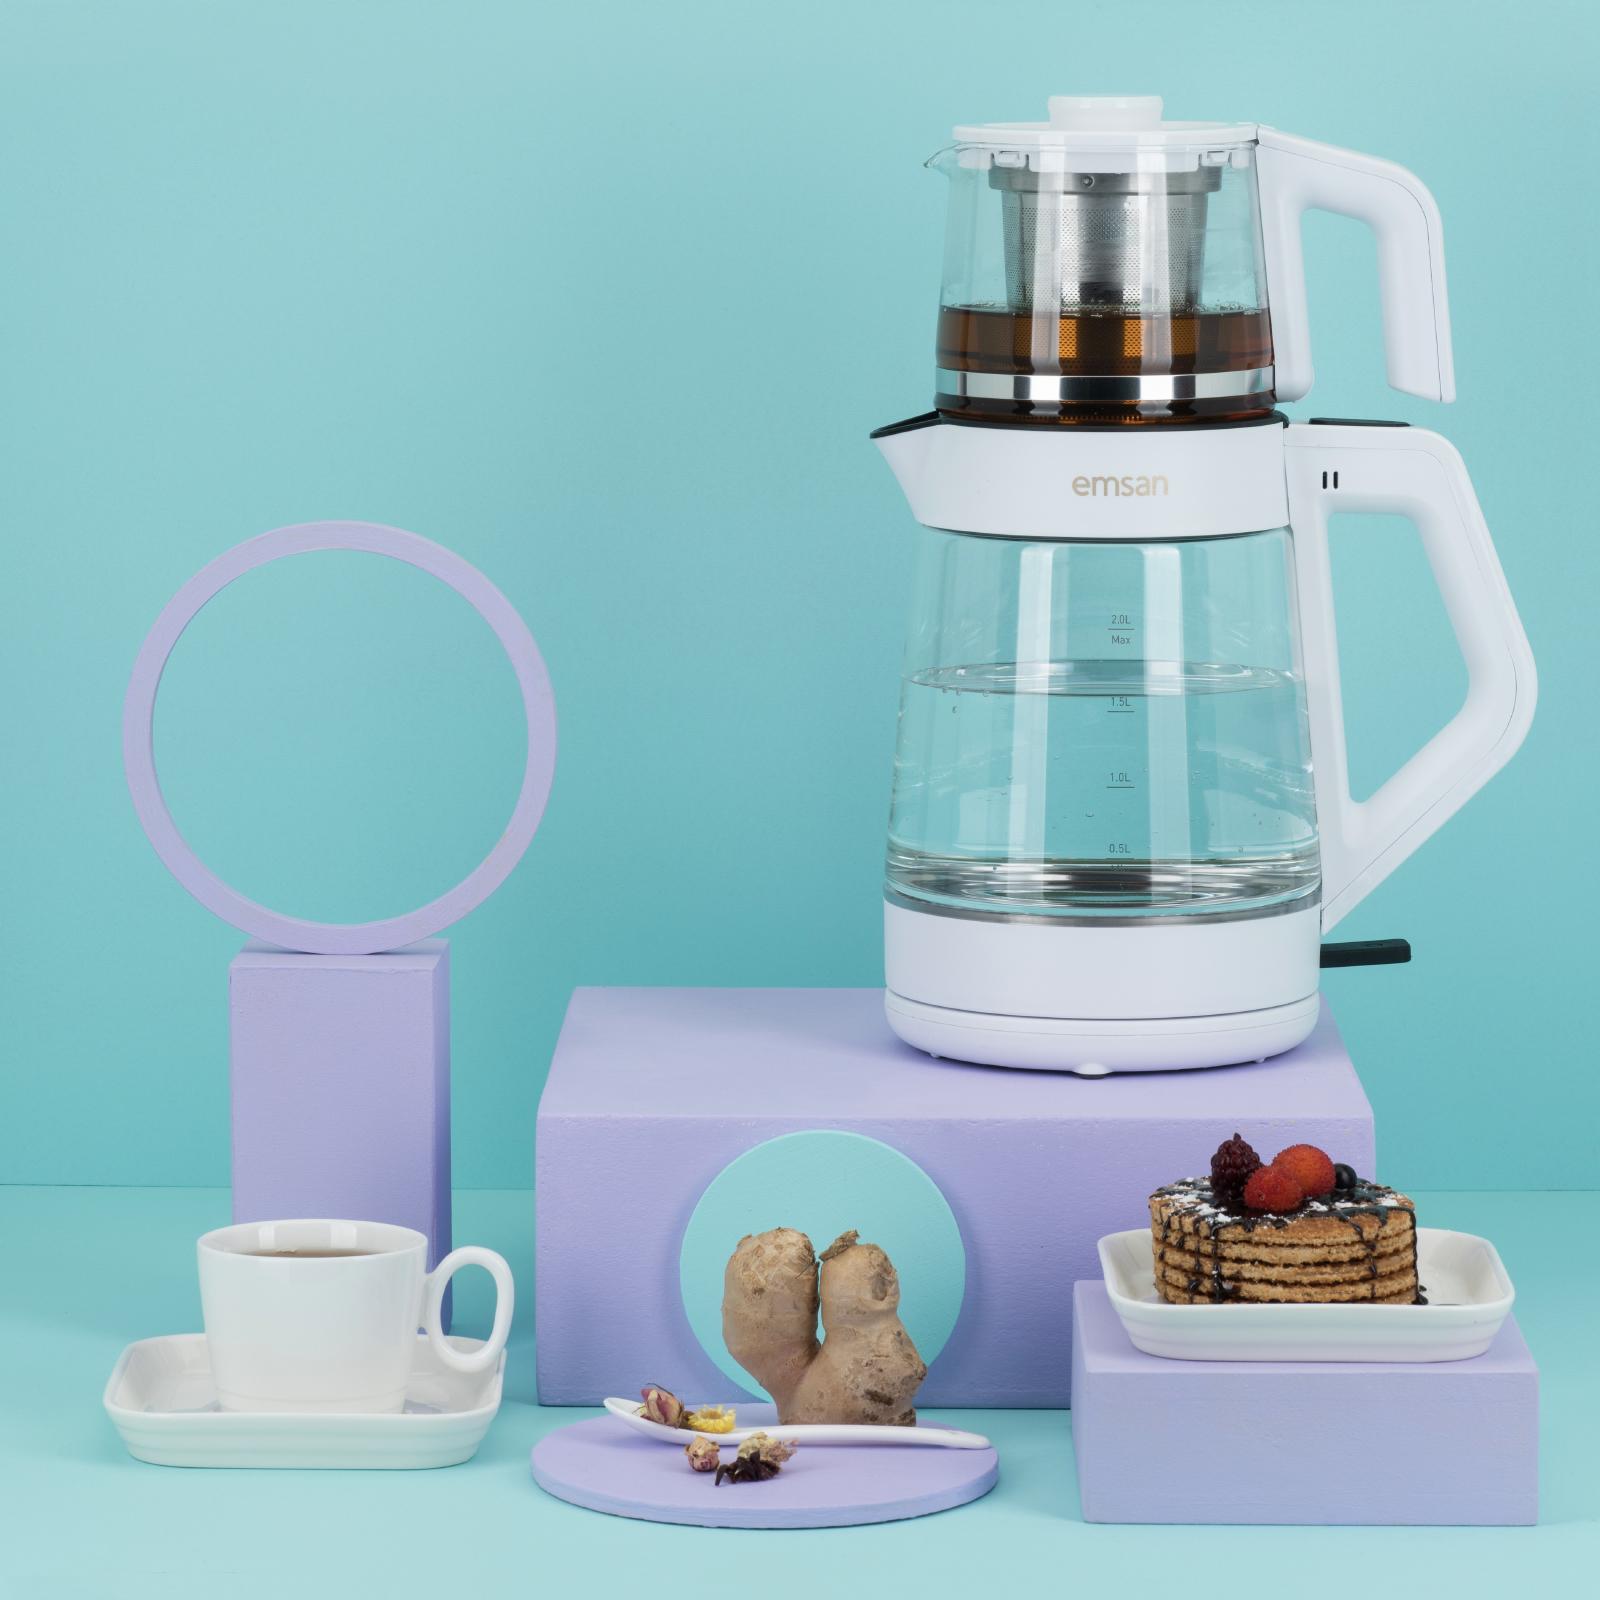 Emsan Magic Master Çay Makinesi Beyaz